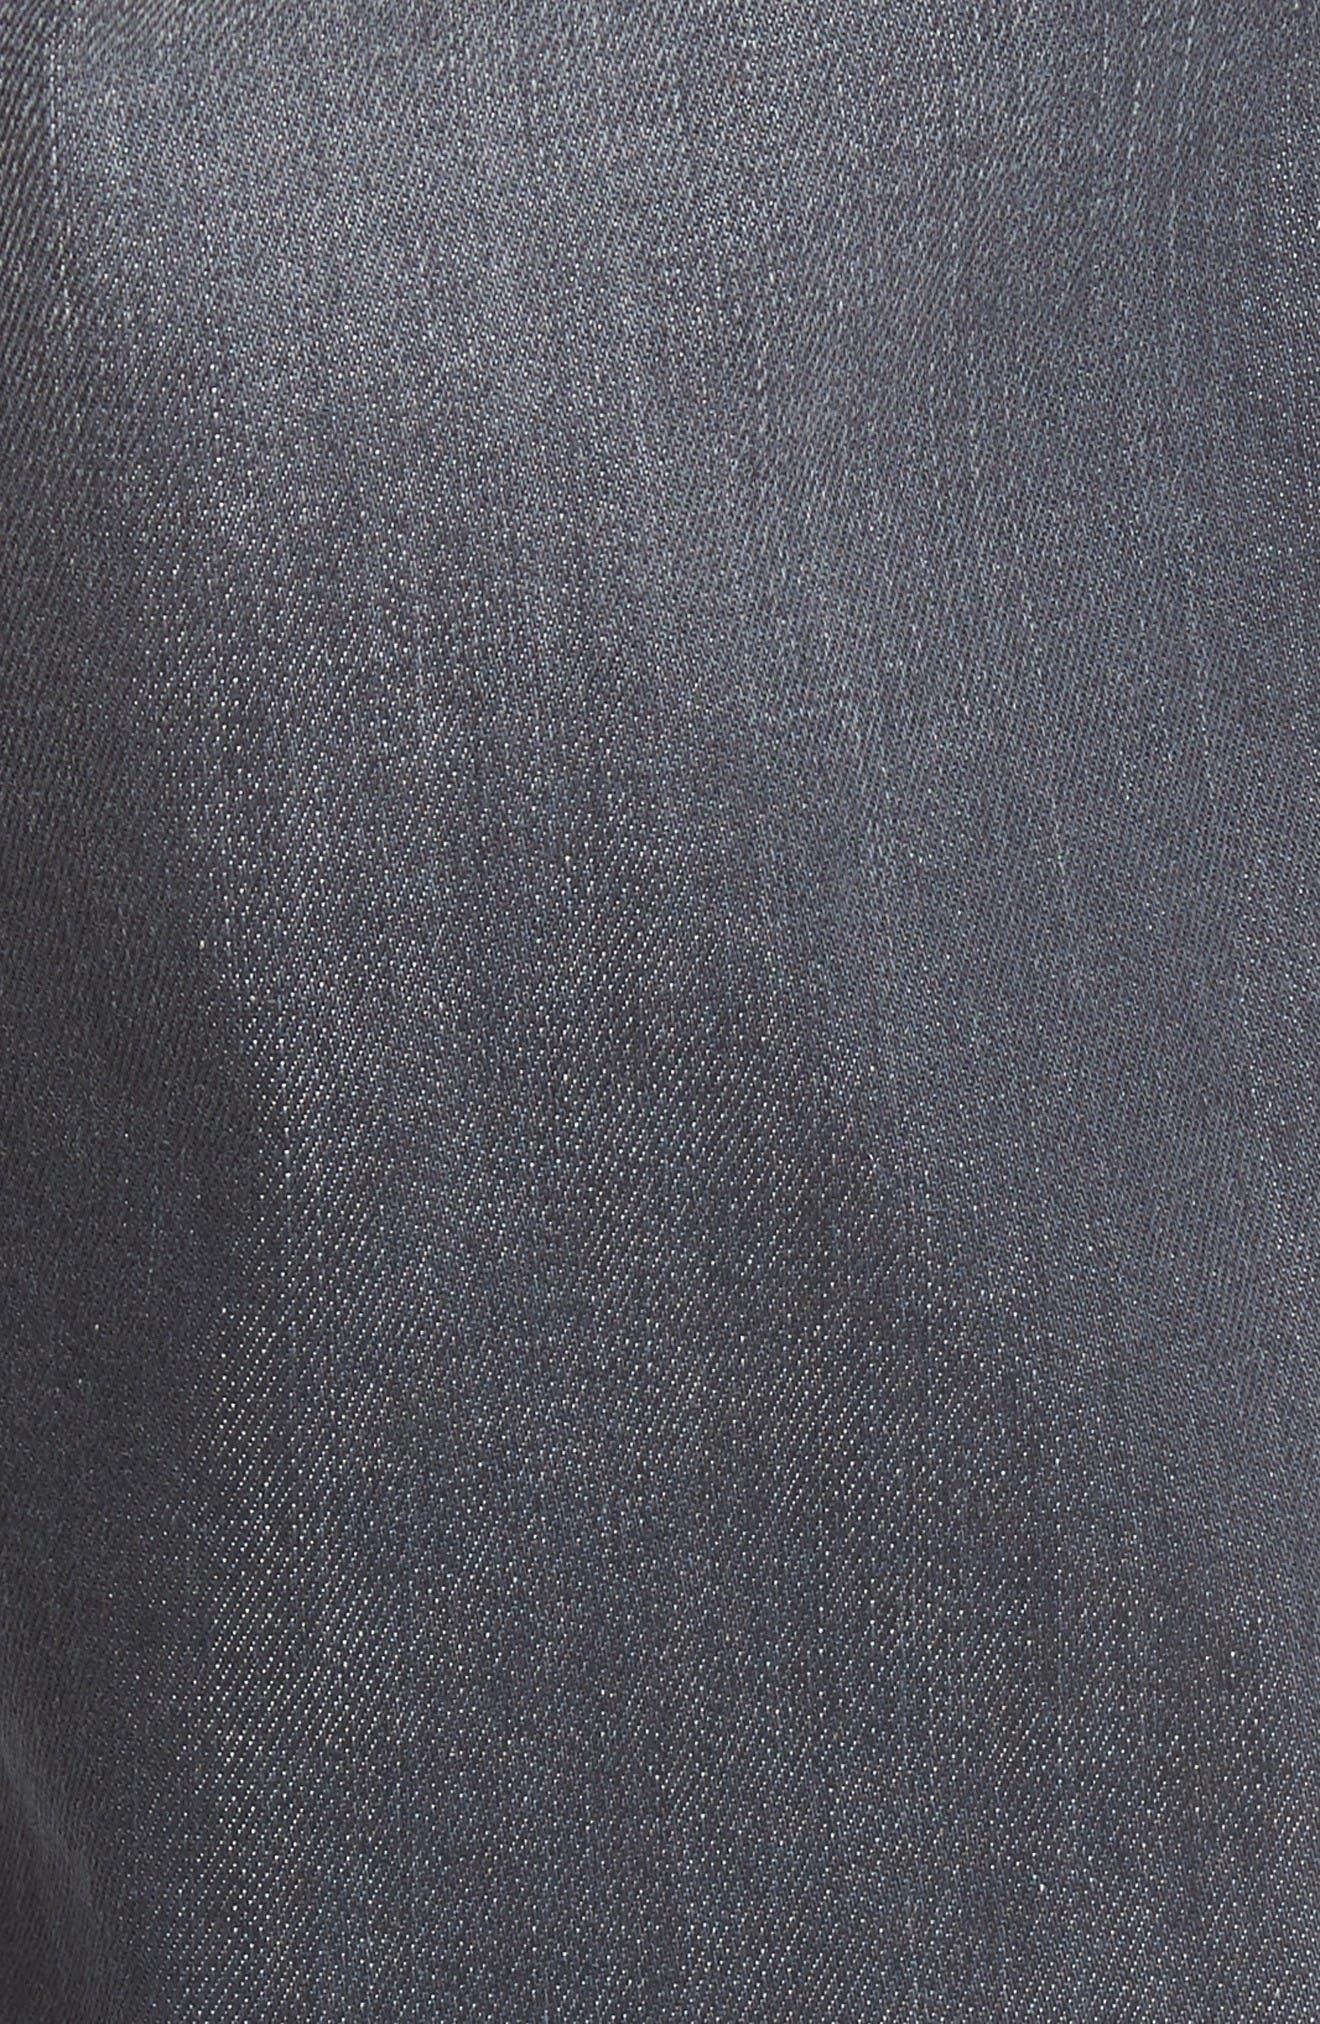 Alternate Image 6  - Fidelity Denim Impala Straight Leg Jeans (River Dark)